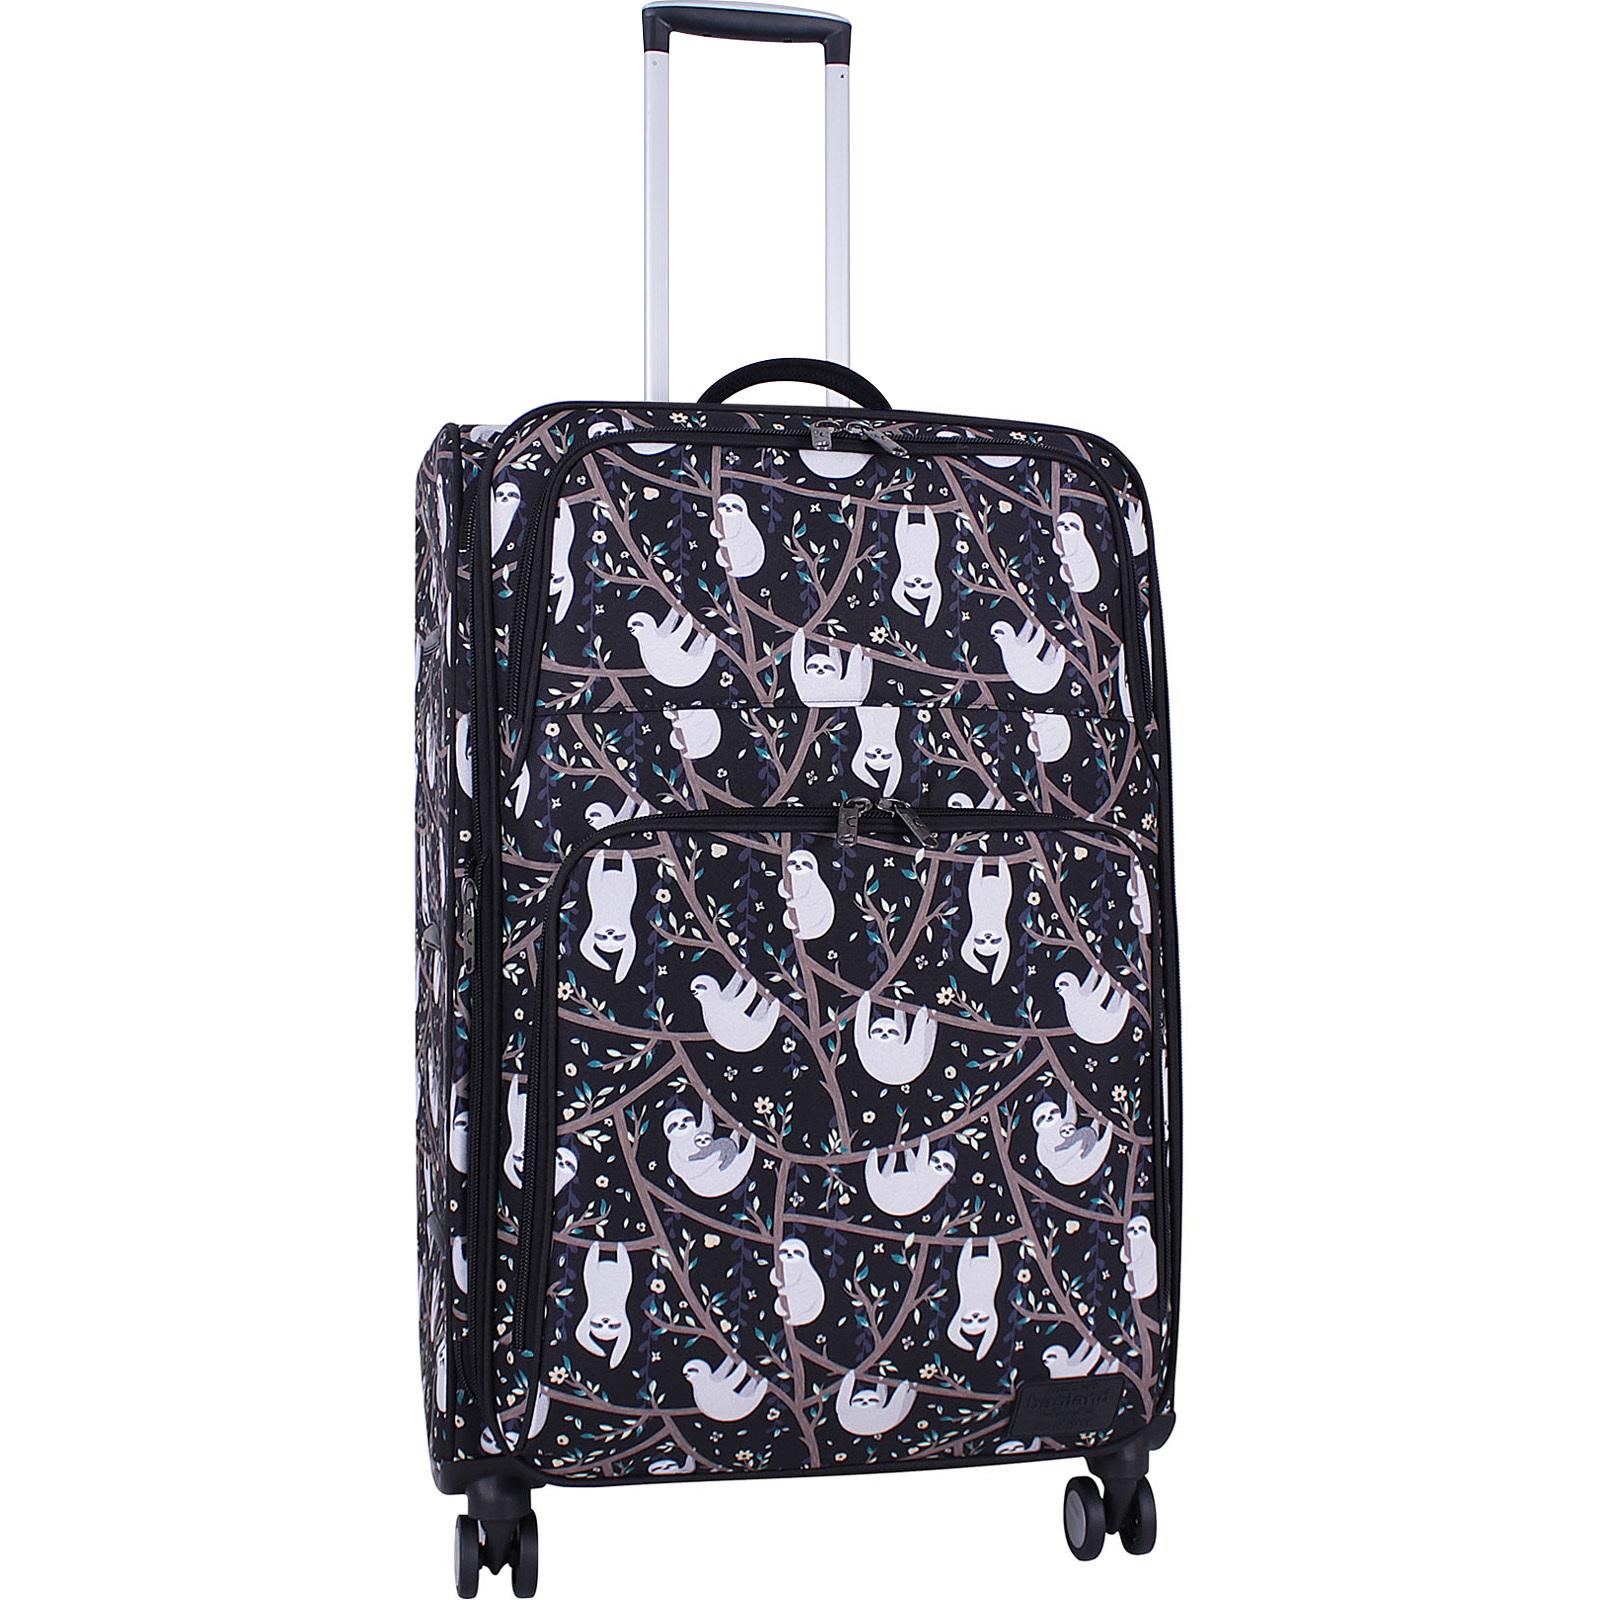 Дорожные чемоданы Чемодан Bagland Валенсия большой дизайн 83л. сублімація 760 (0037966274) IMG_8801_суб.760_.JPG